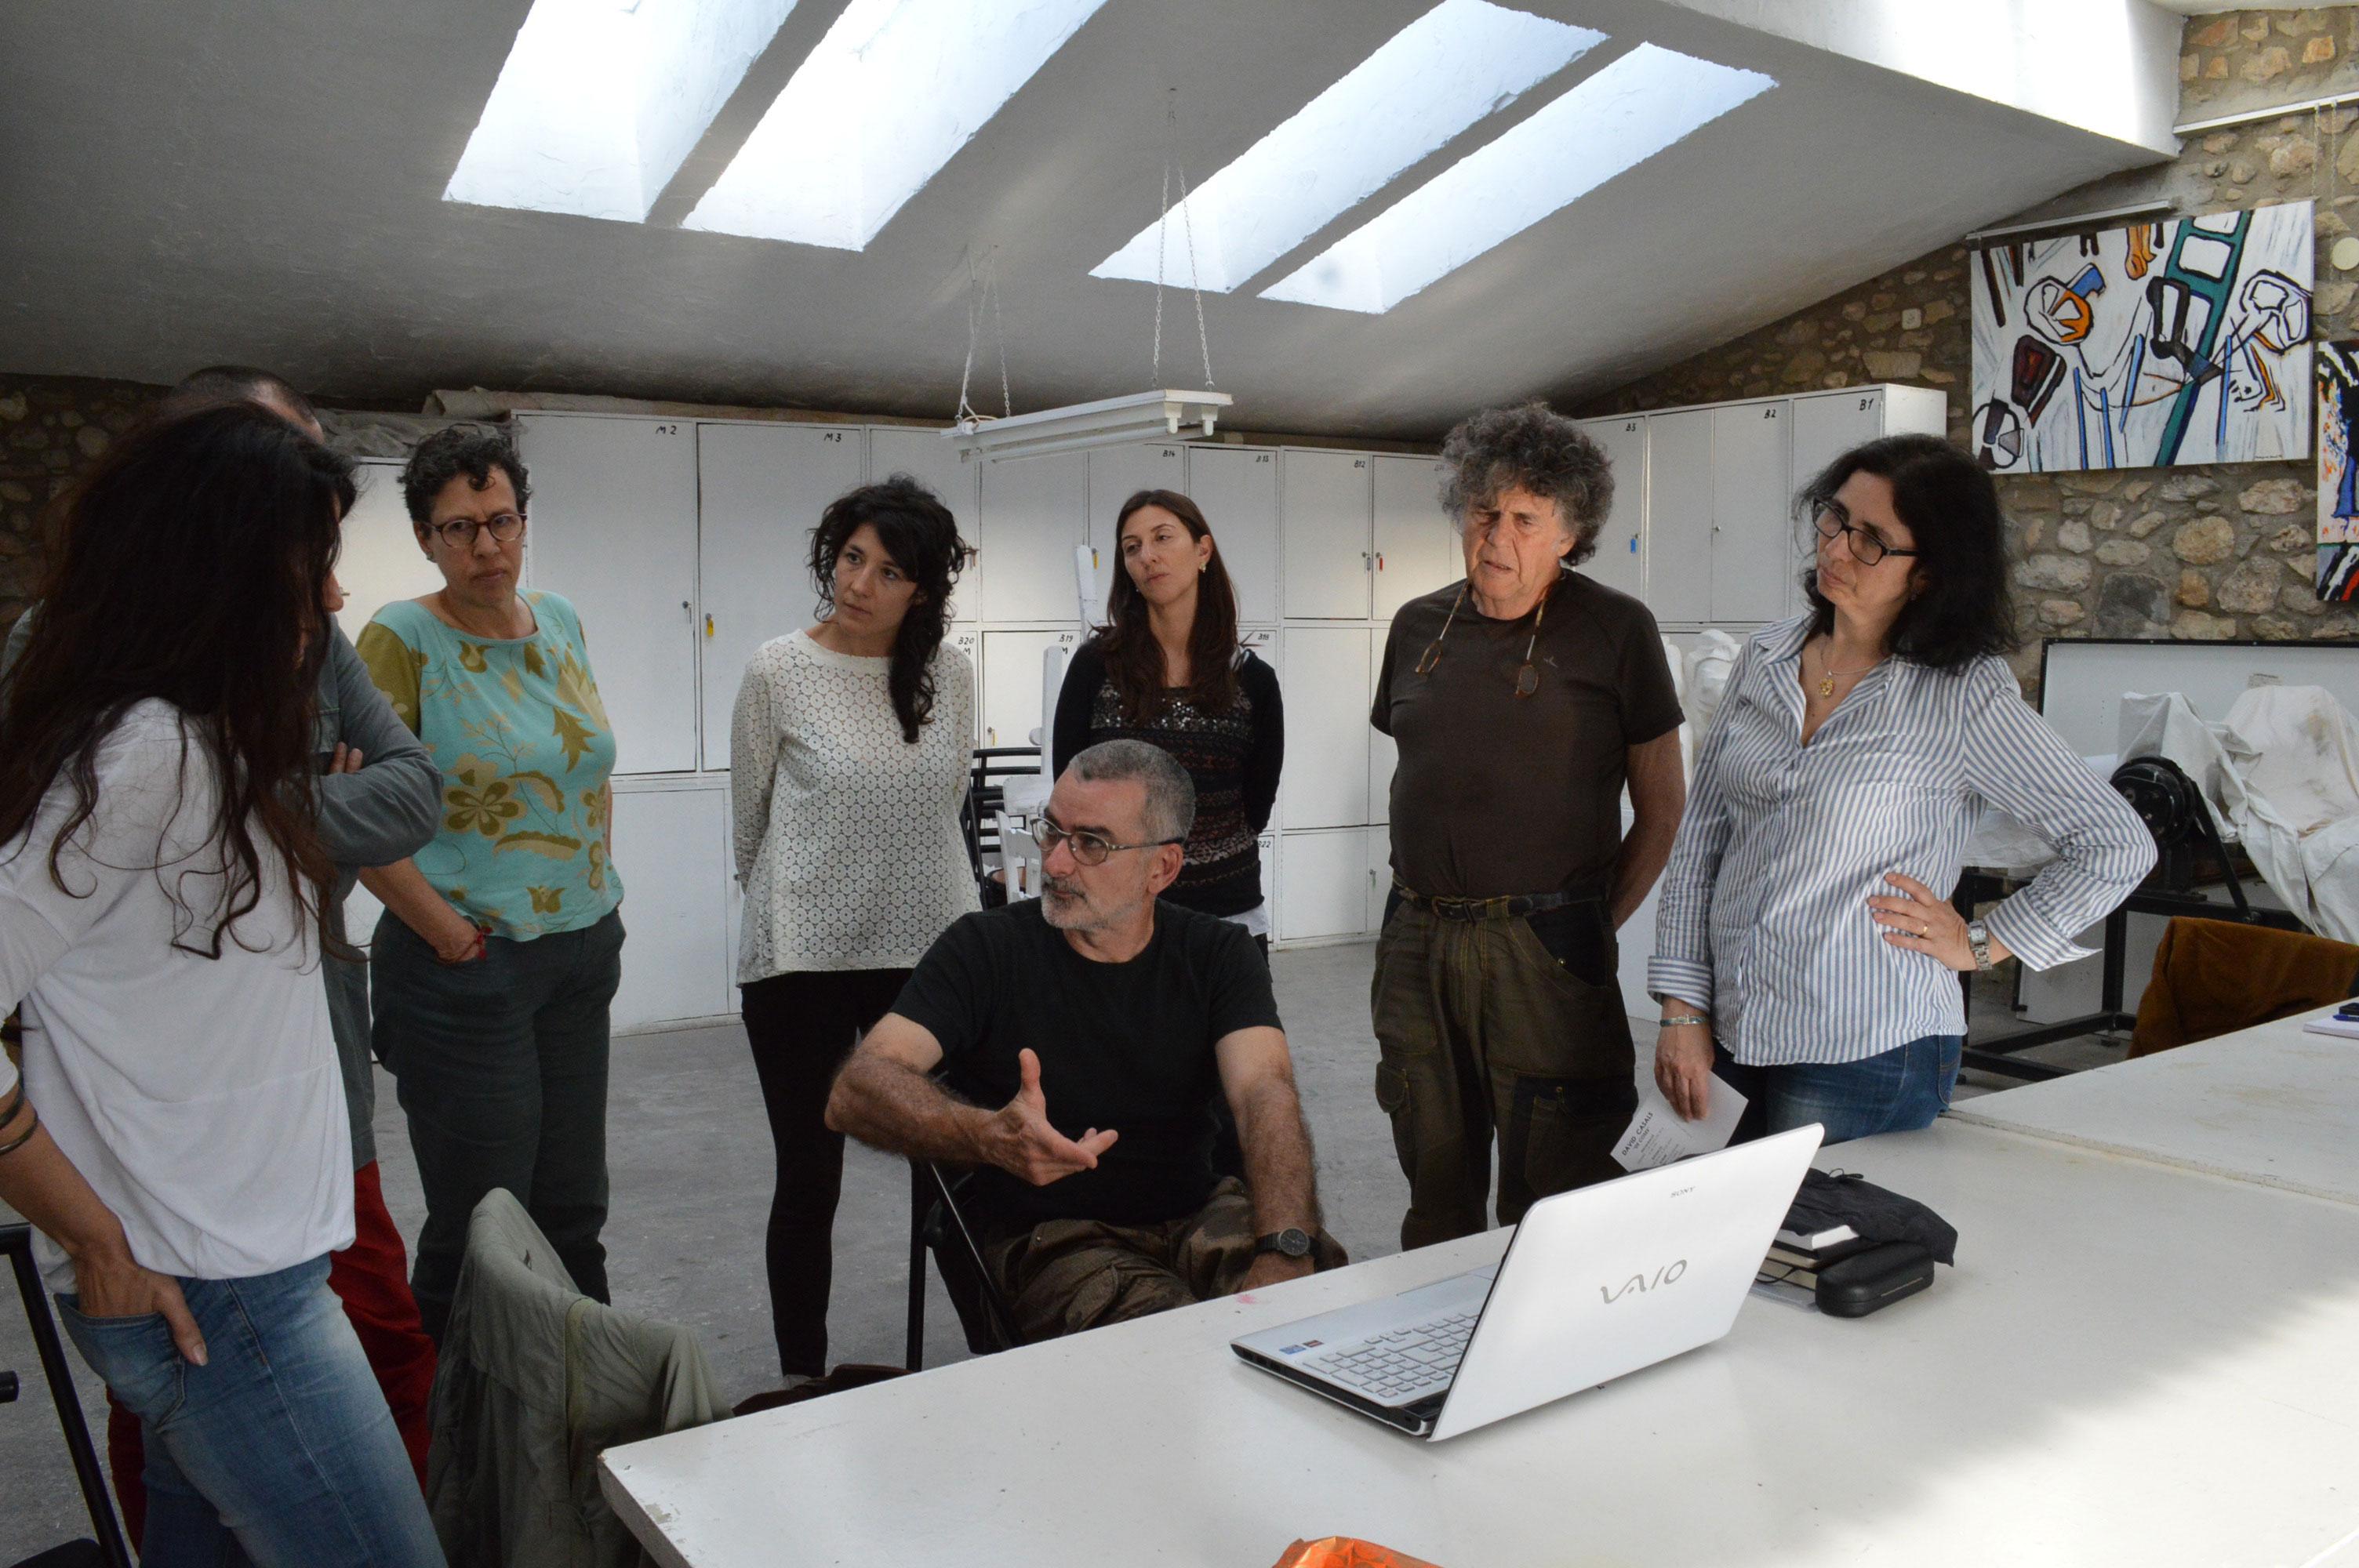 Fundació Rodríguez Amat